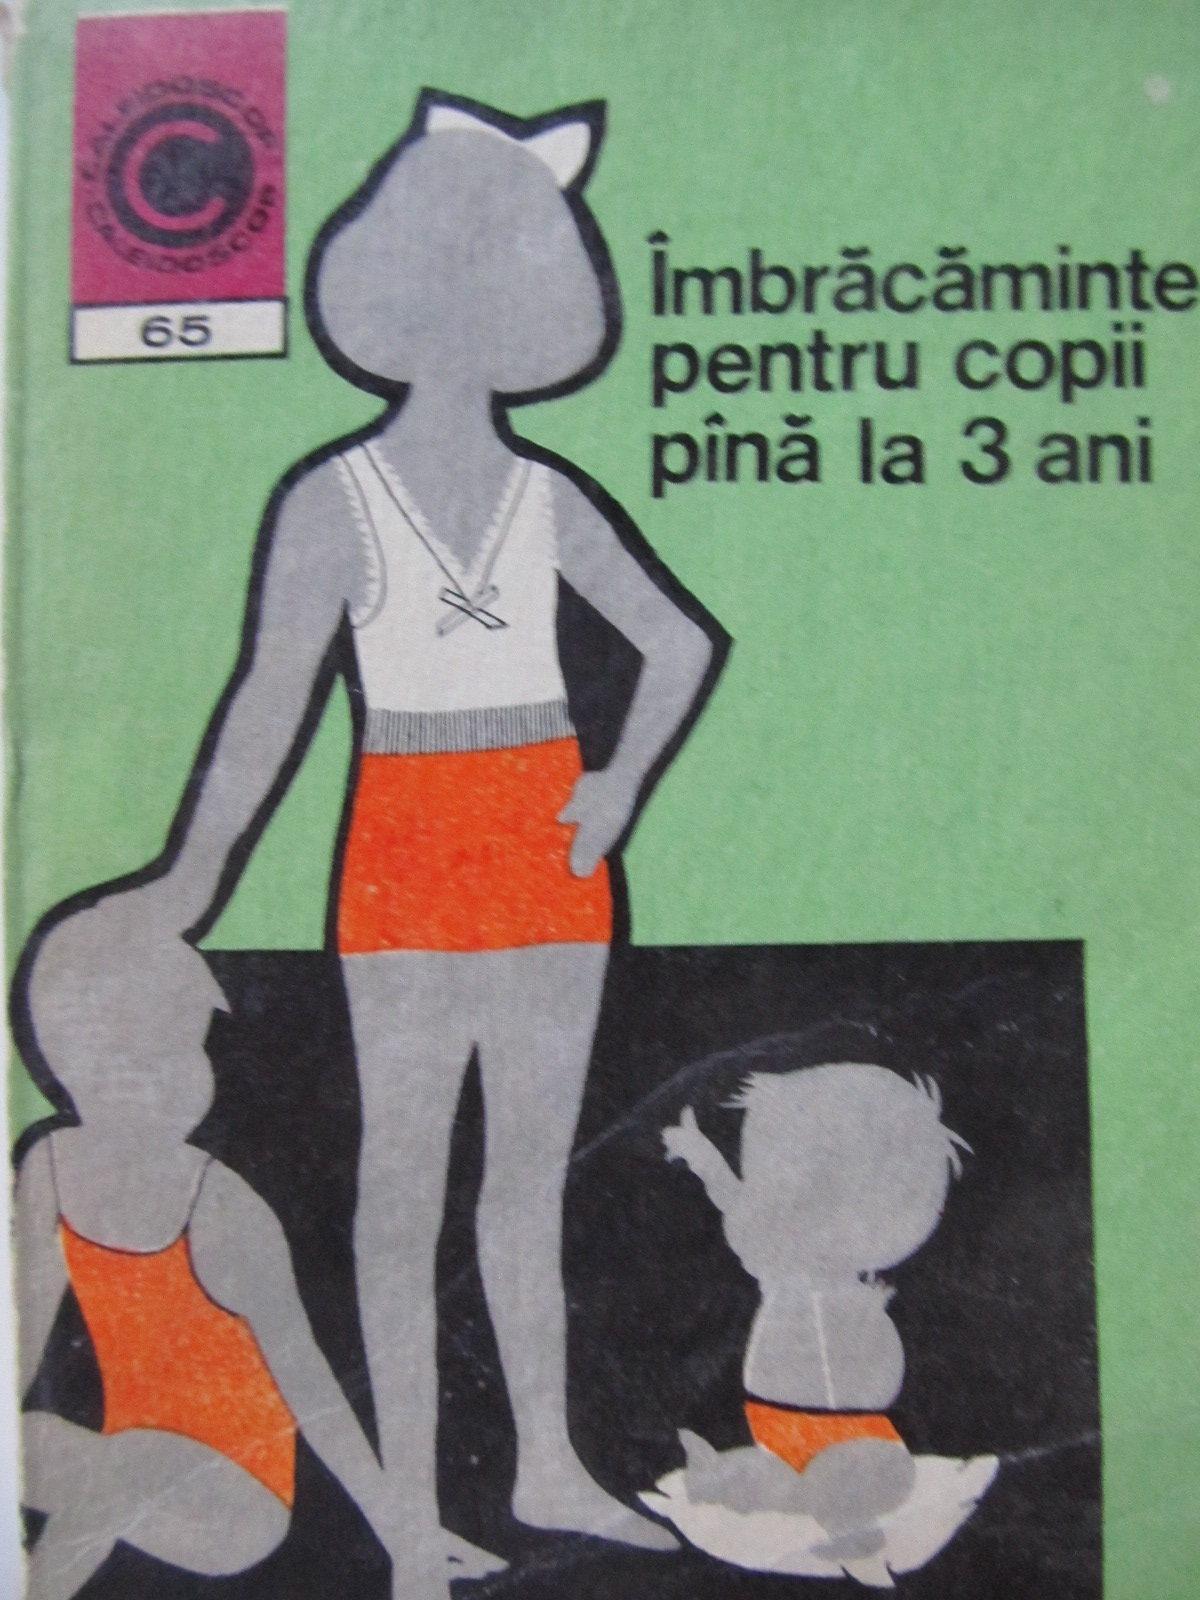 Imbracaminte pentru copii pana la 3 ani (65) - Natalia Tautu Stanescu | Detalii carte